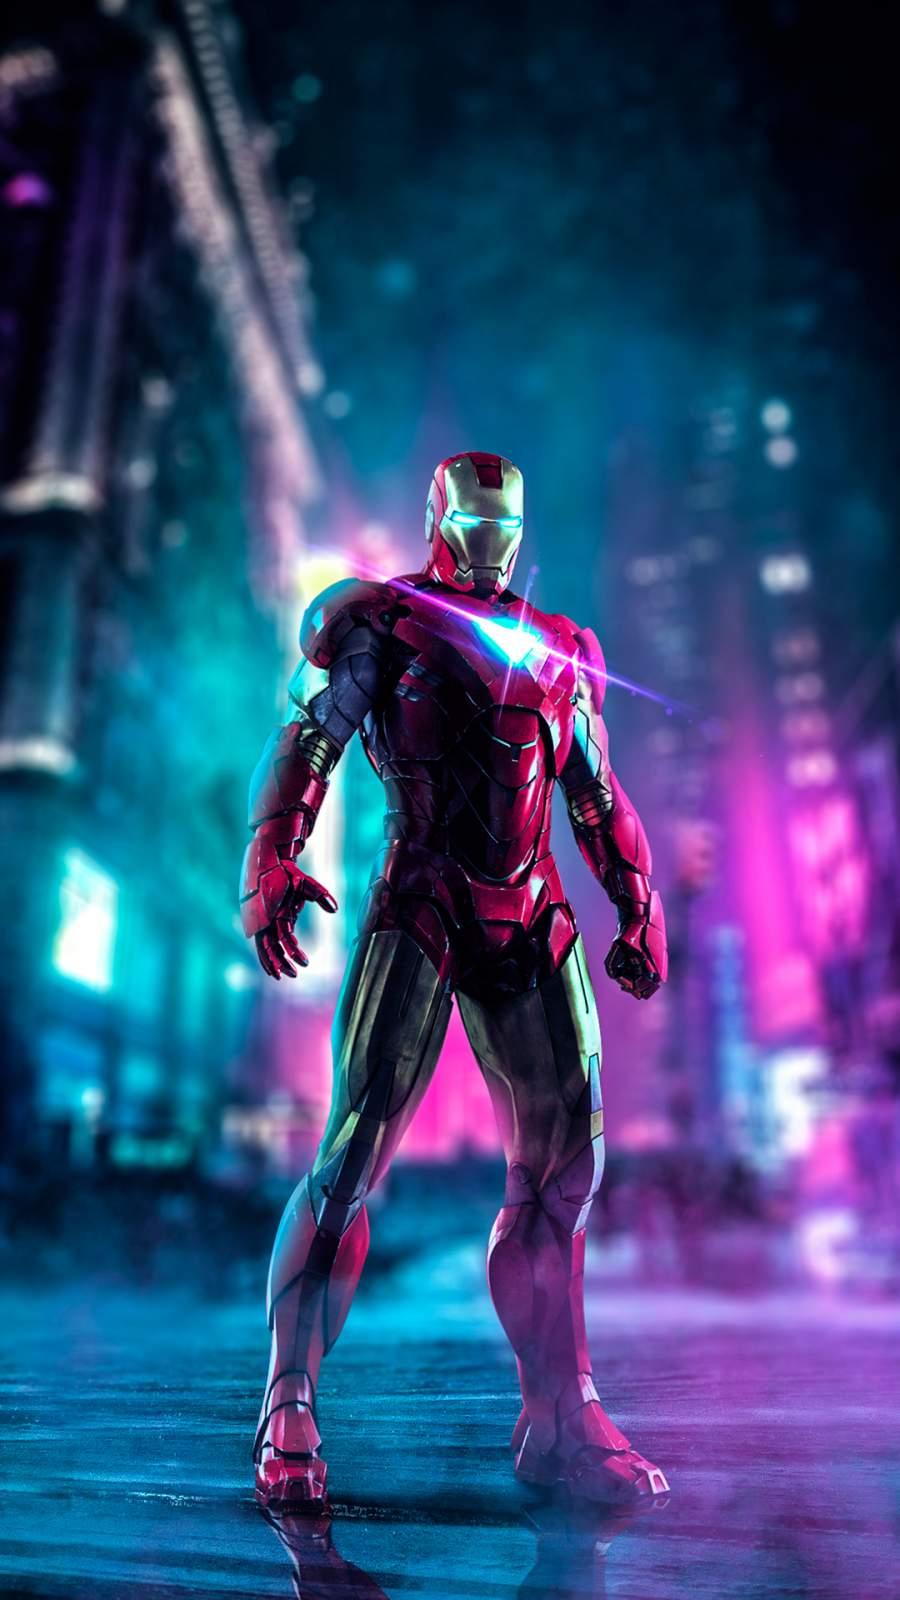 Iron Man City Art iPhone Wallpaper